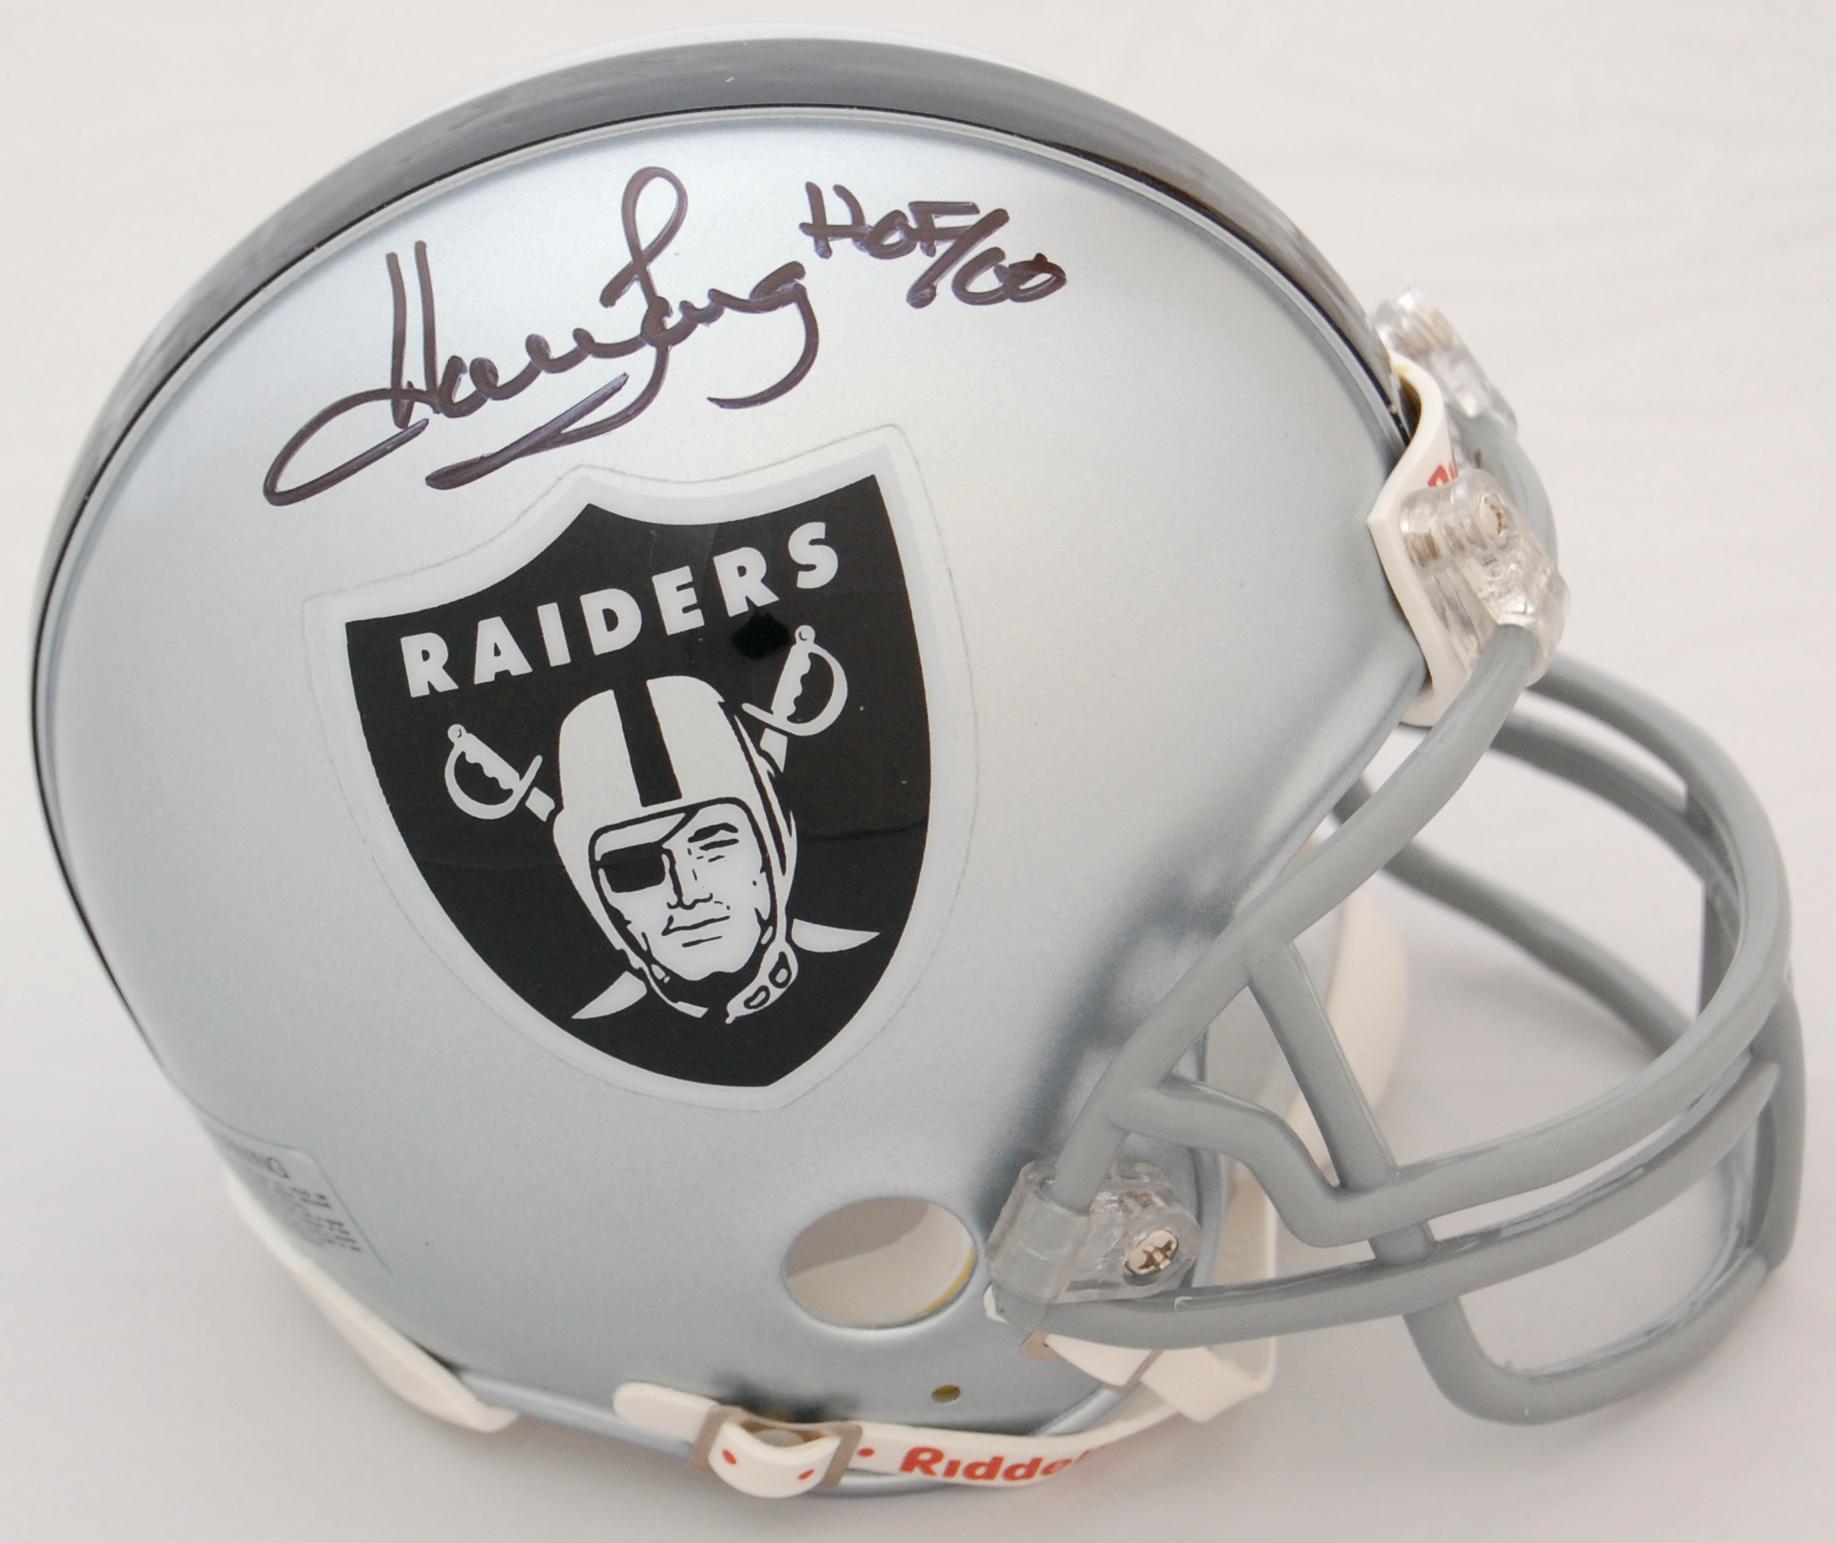 Howie Long Oakland Raiders Autographed Mini Helmet